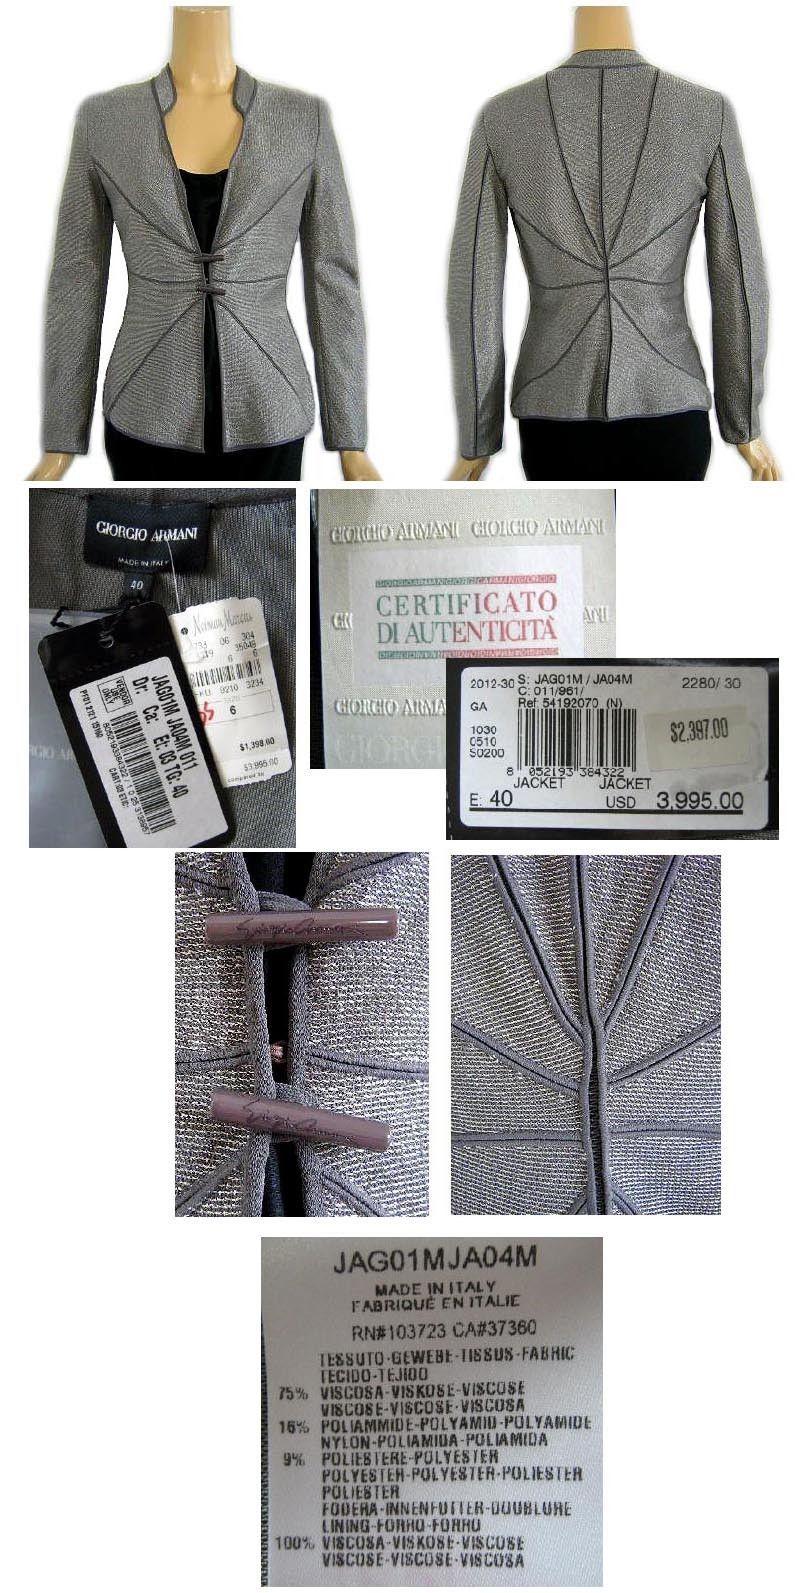 Giorgio Armani Silver Gray Metallic Evening Jacket Neiman Marcus 6 NWT $3995